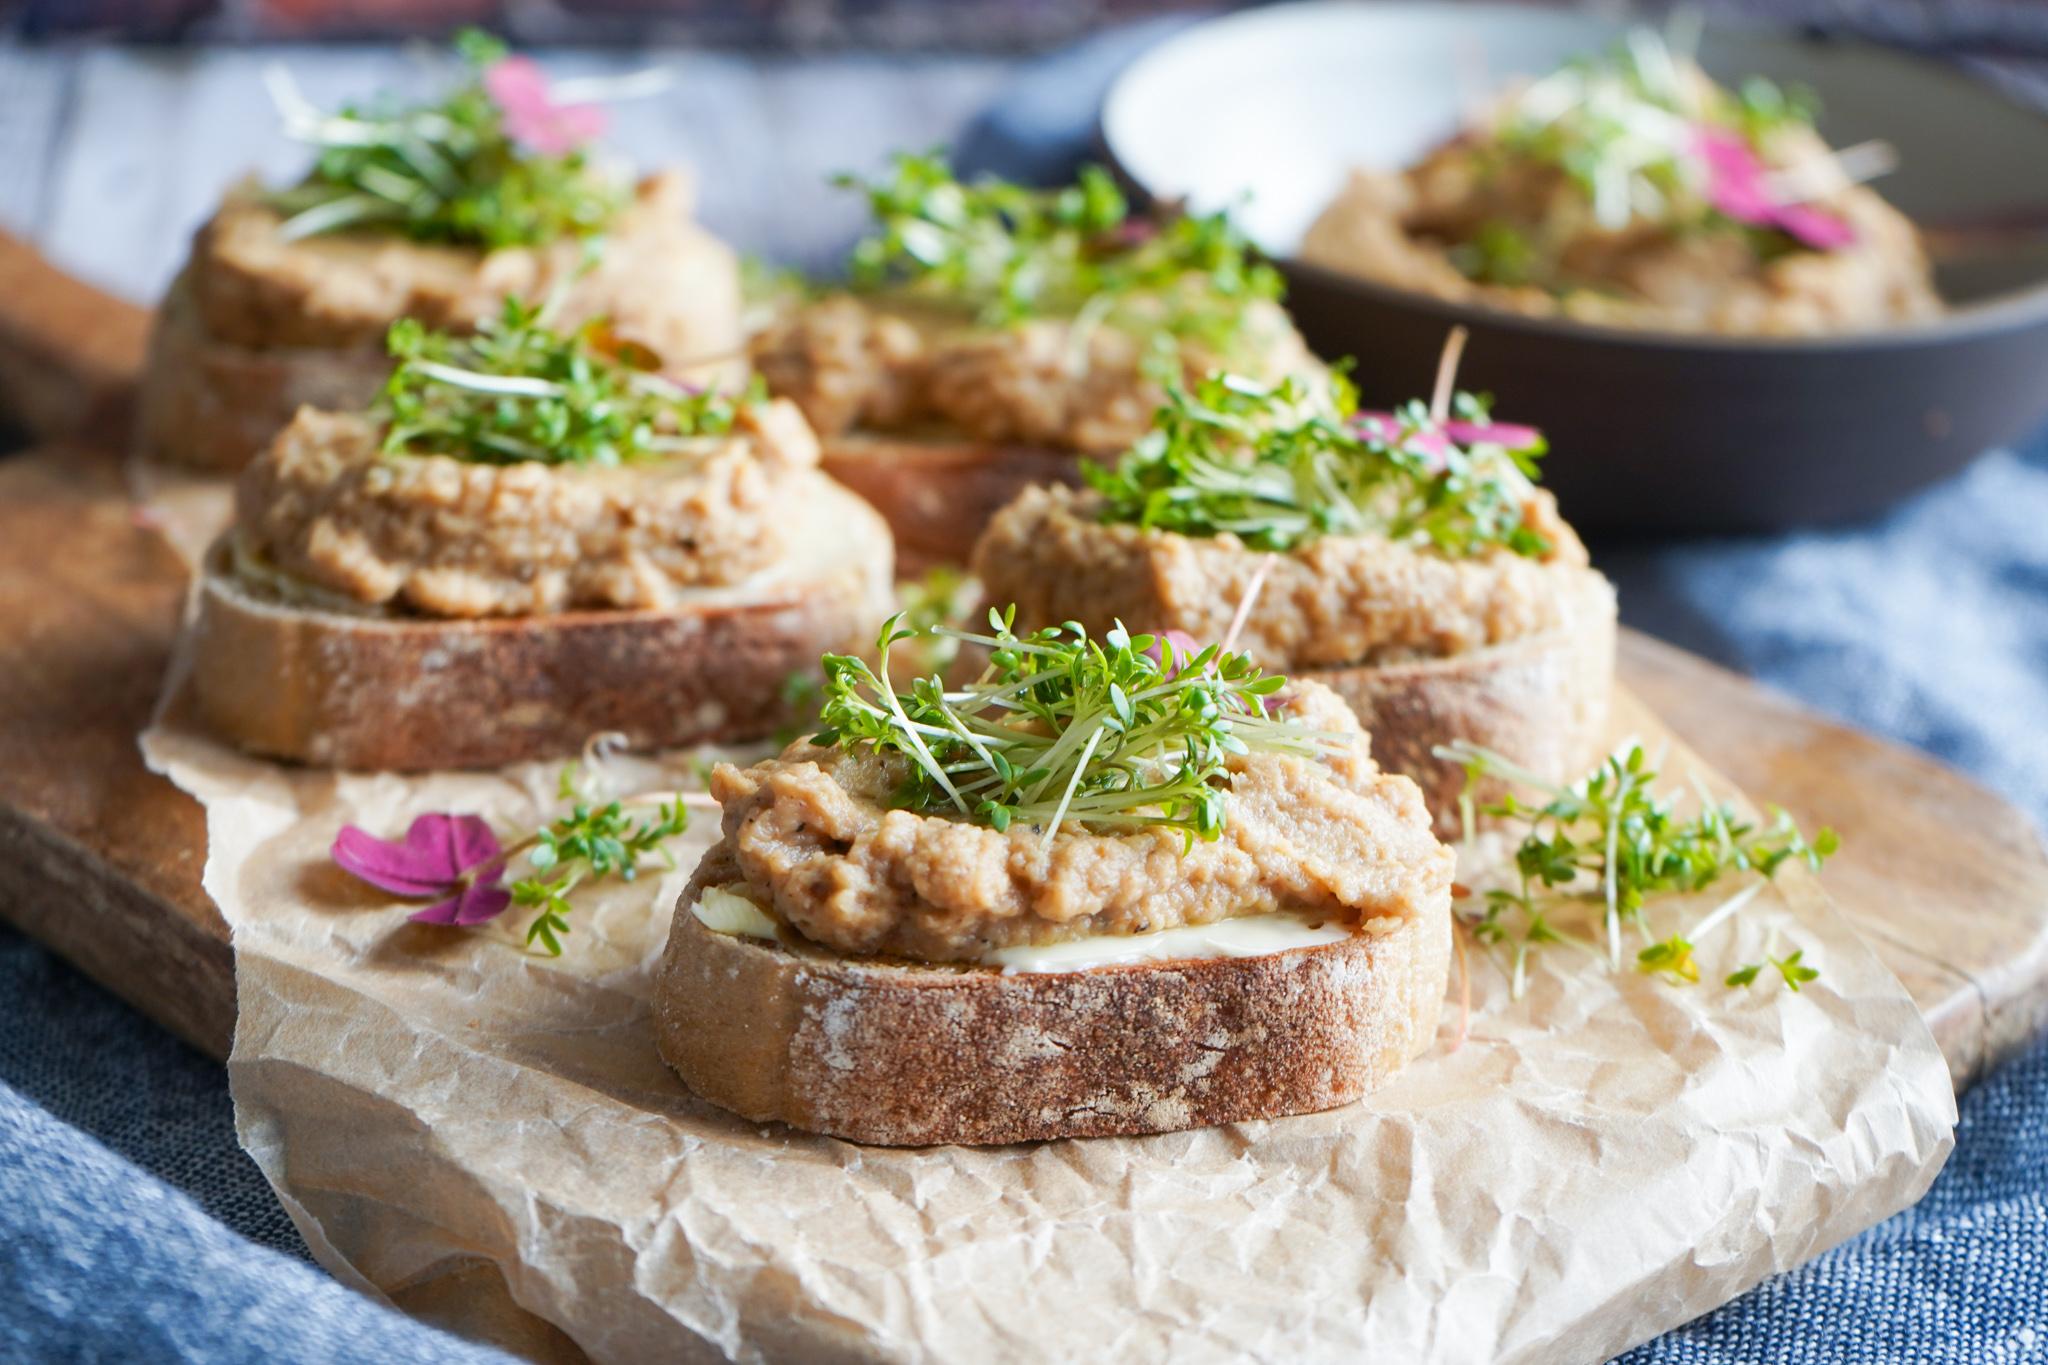 Knoldsellerimos – Små Brød Med Knoldselleri Og Karse